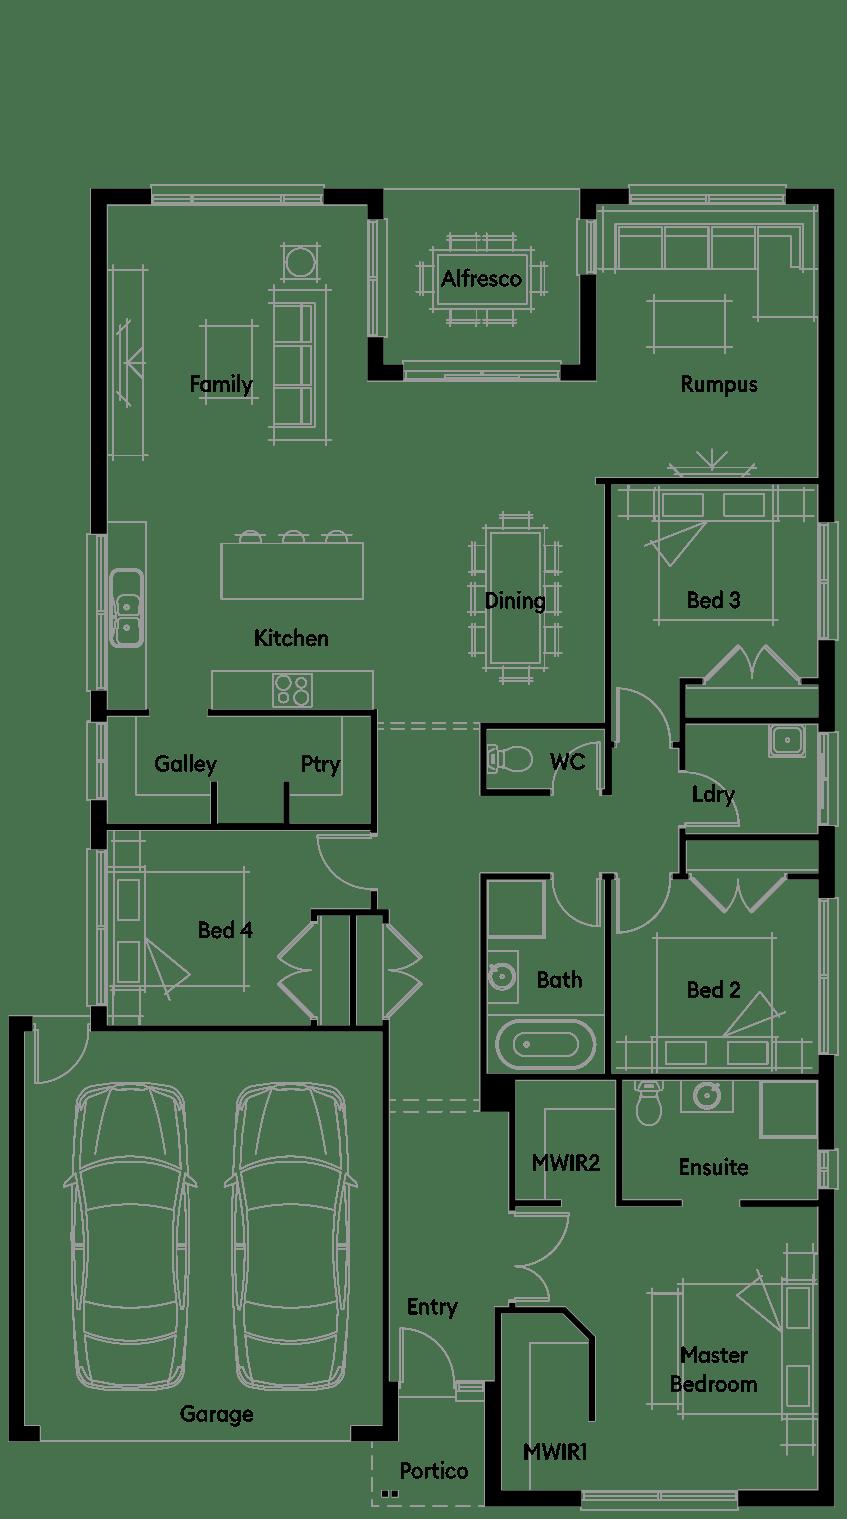 FloorPlan1_HOUSE761_Liverpool_25-1